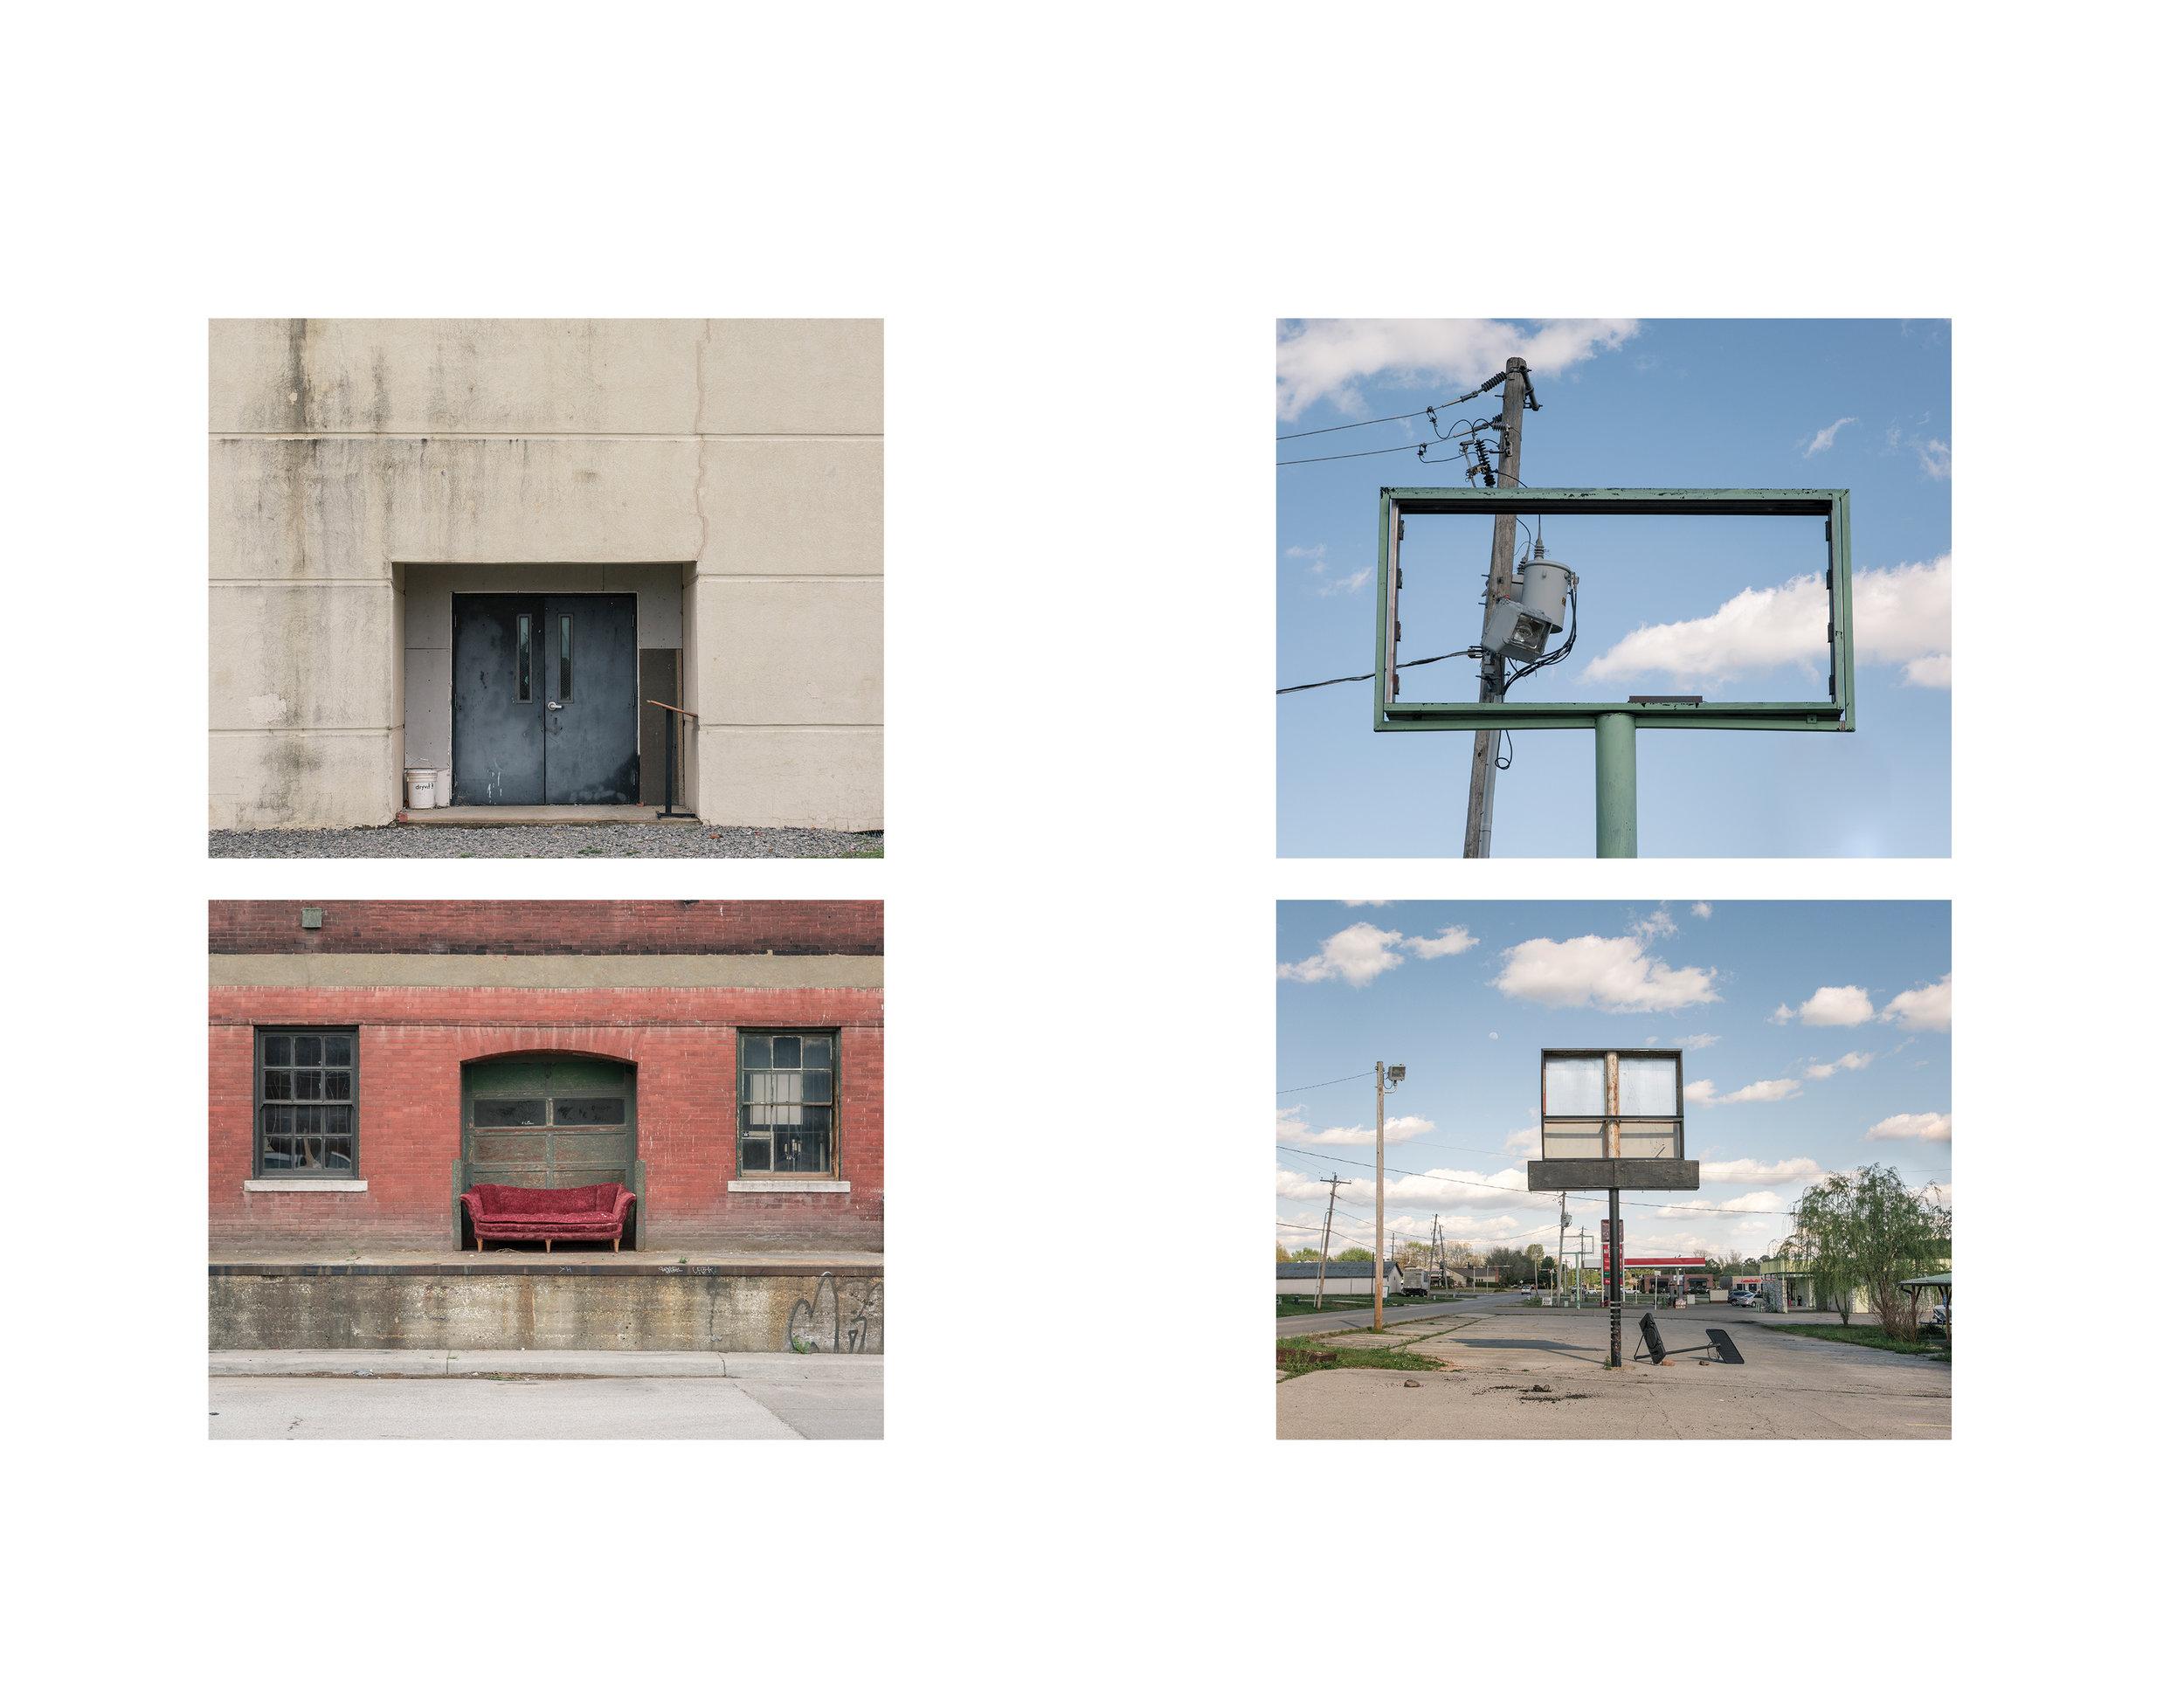 Photos by Clayton Bruce Lyon